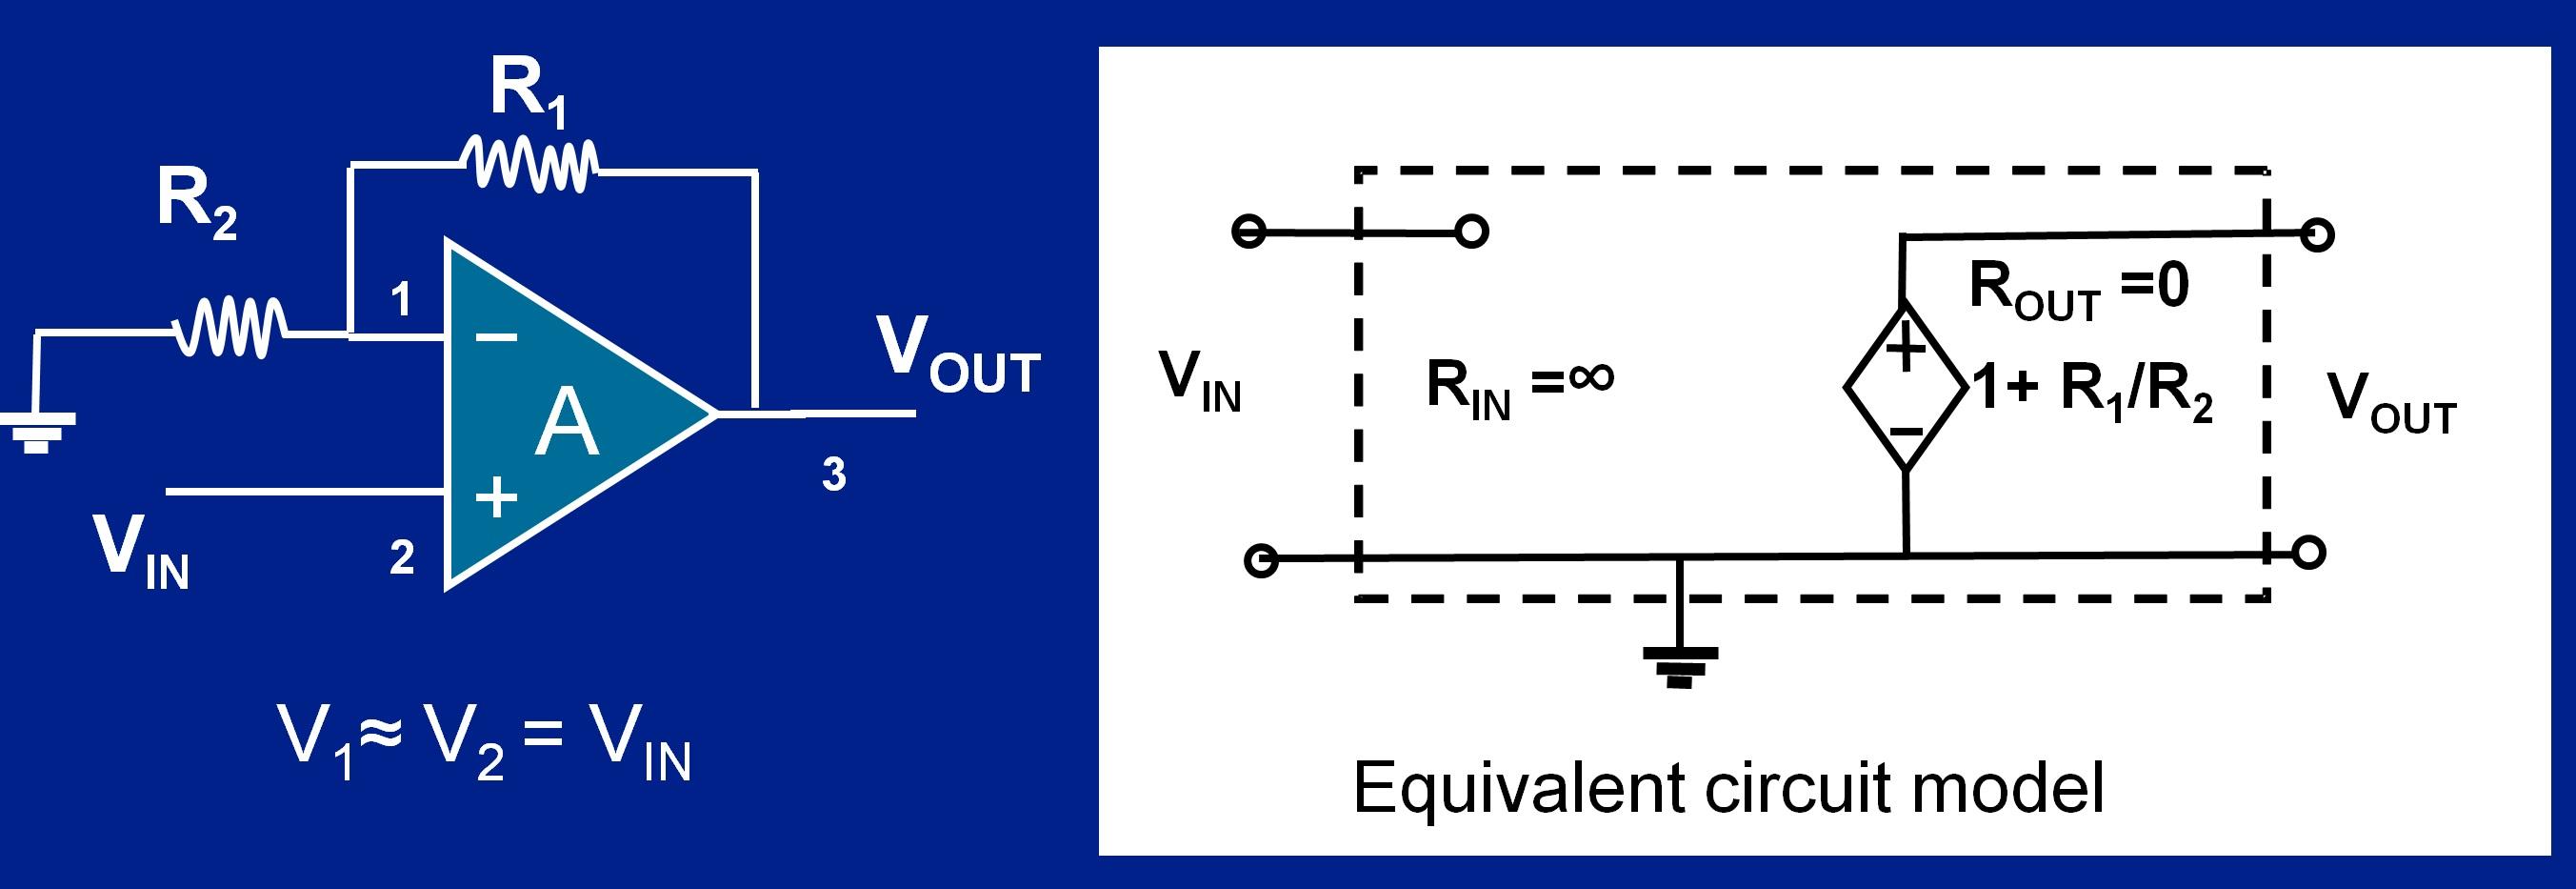 circuit diagram of non inverting amplifier toyota wiring amplifiers developer help opamp model jpg